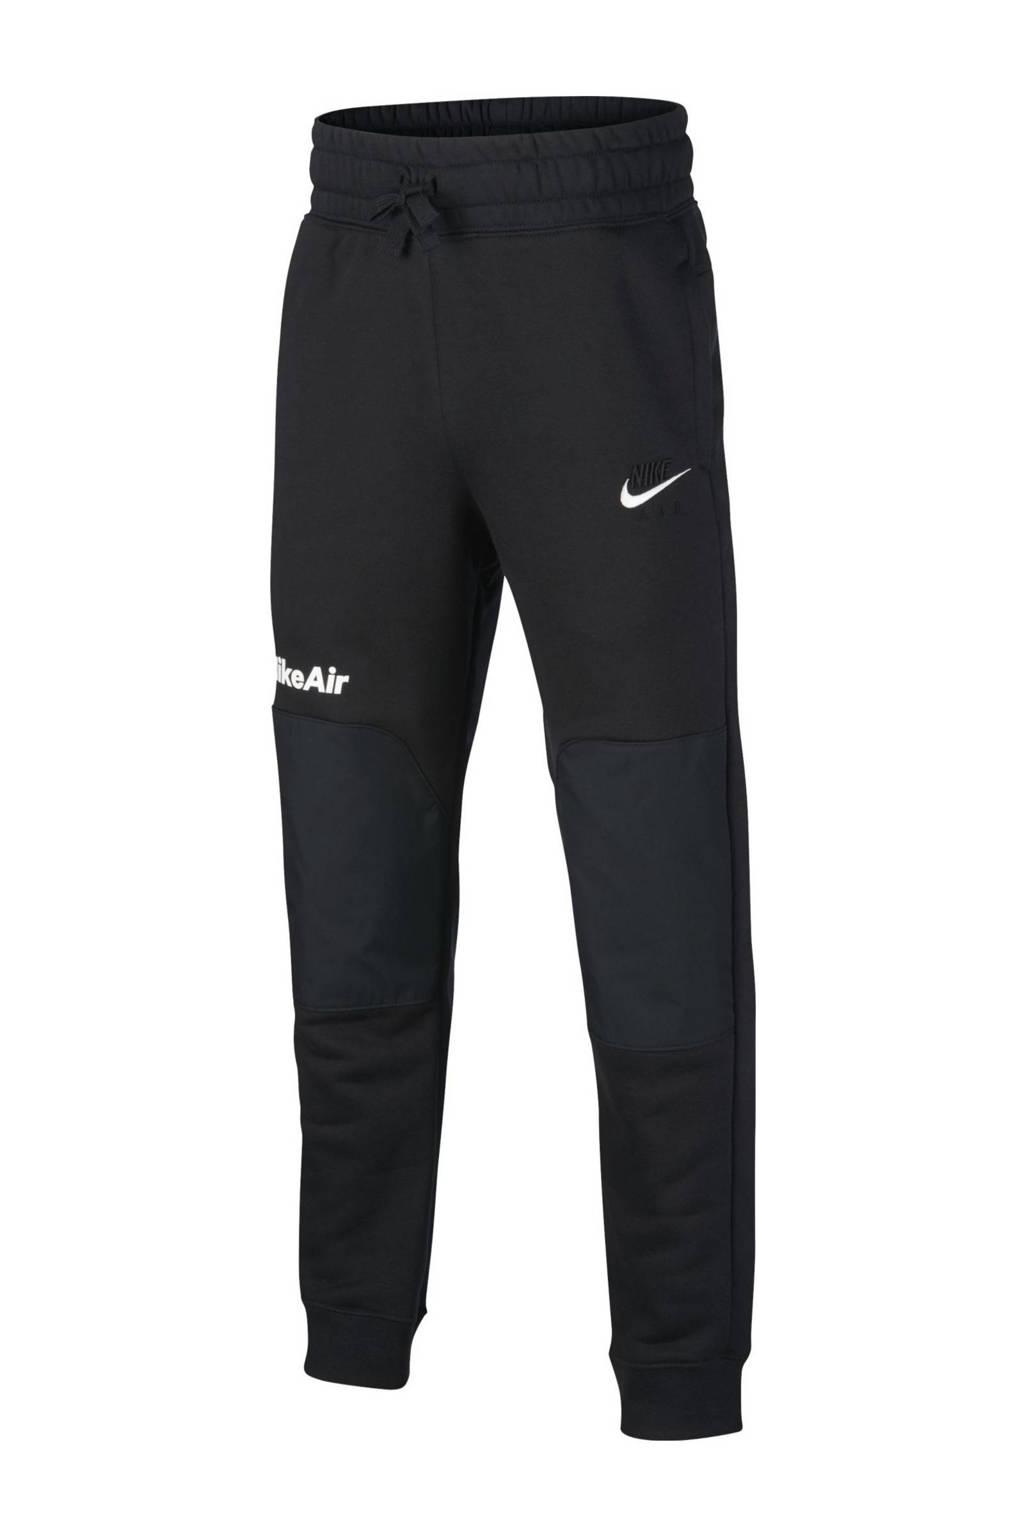 Nike joggingbroek zwart, Zwart